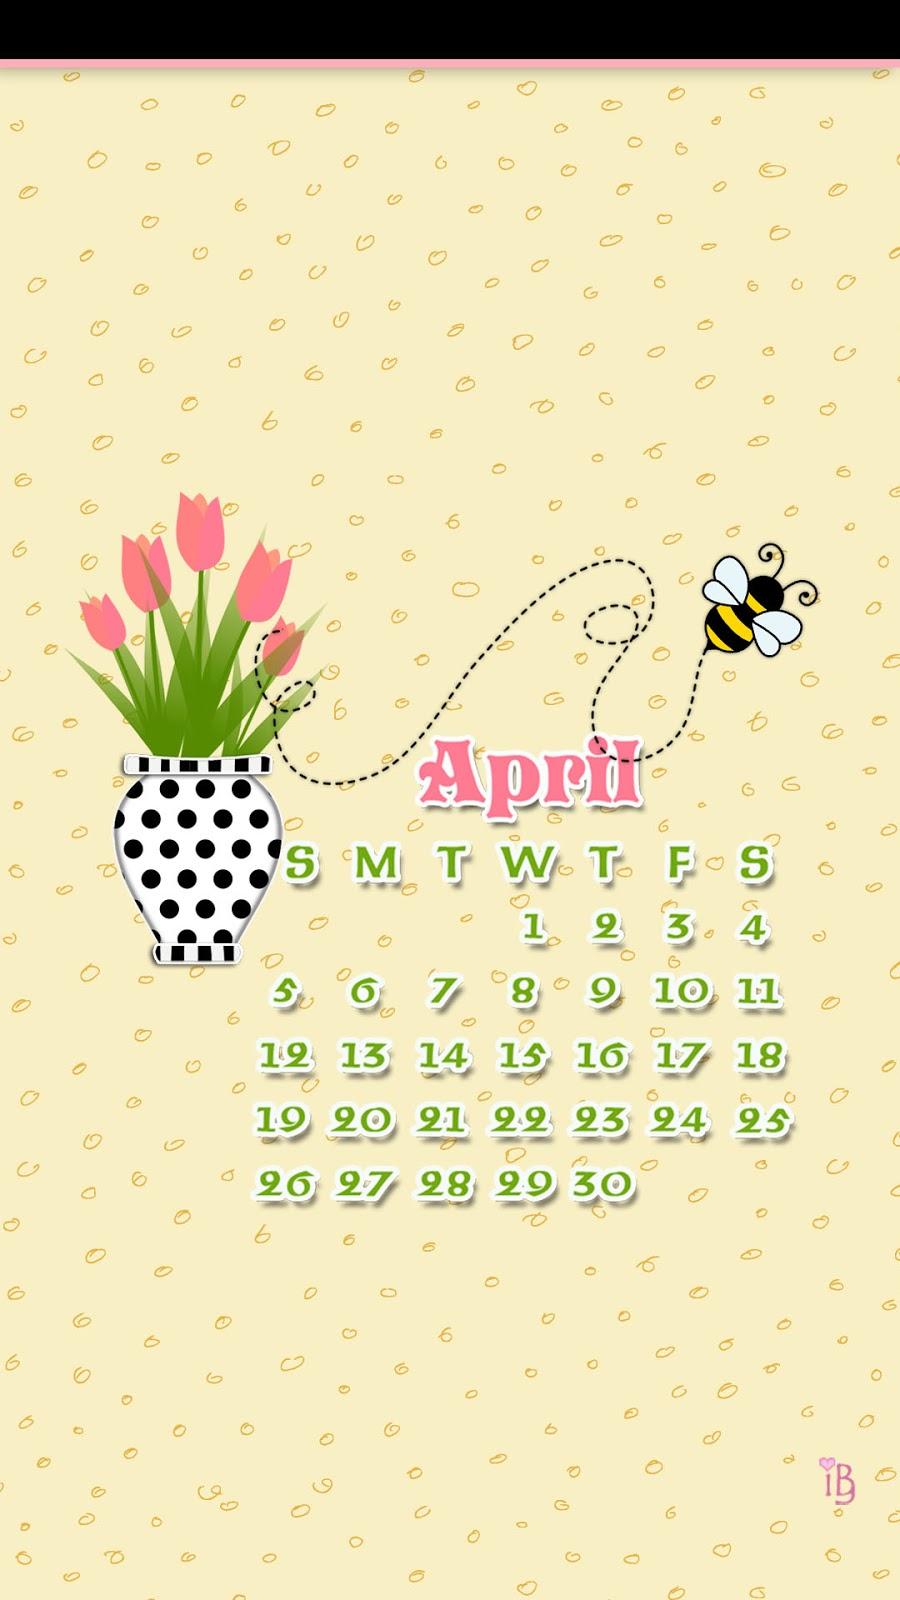 Great Wallpaper Mac Pineapple - ibabygirl_6plusSpring2015_X  Trends_715037.jpg